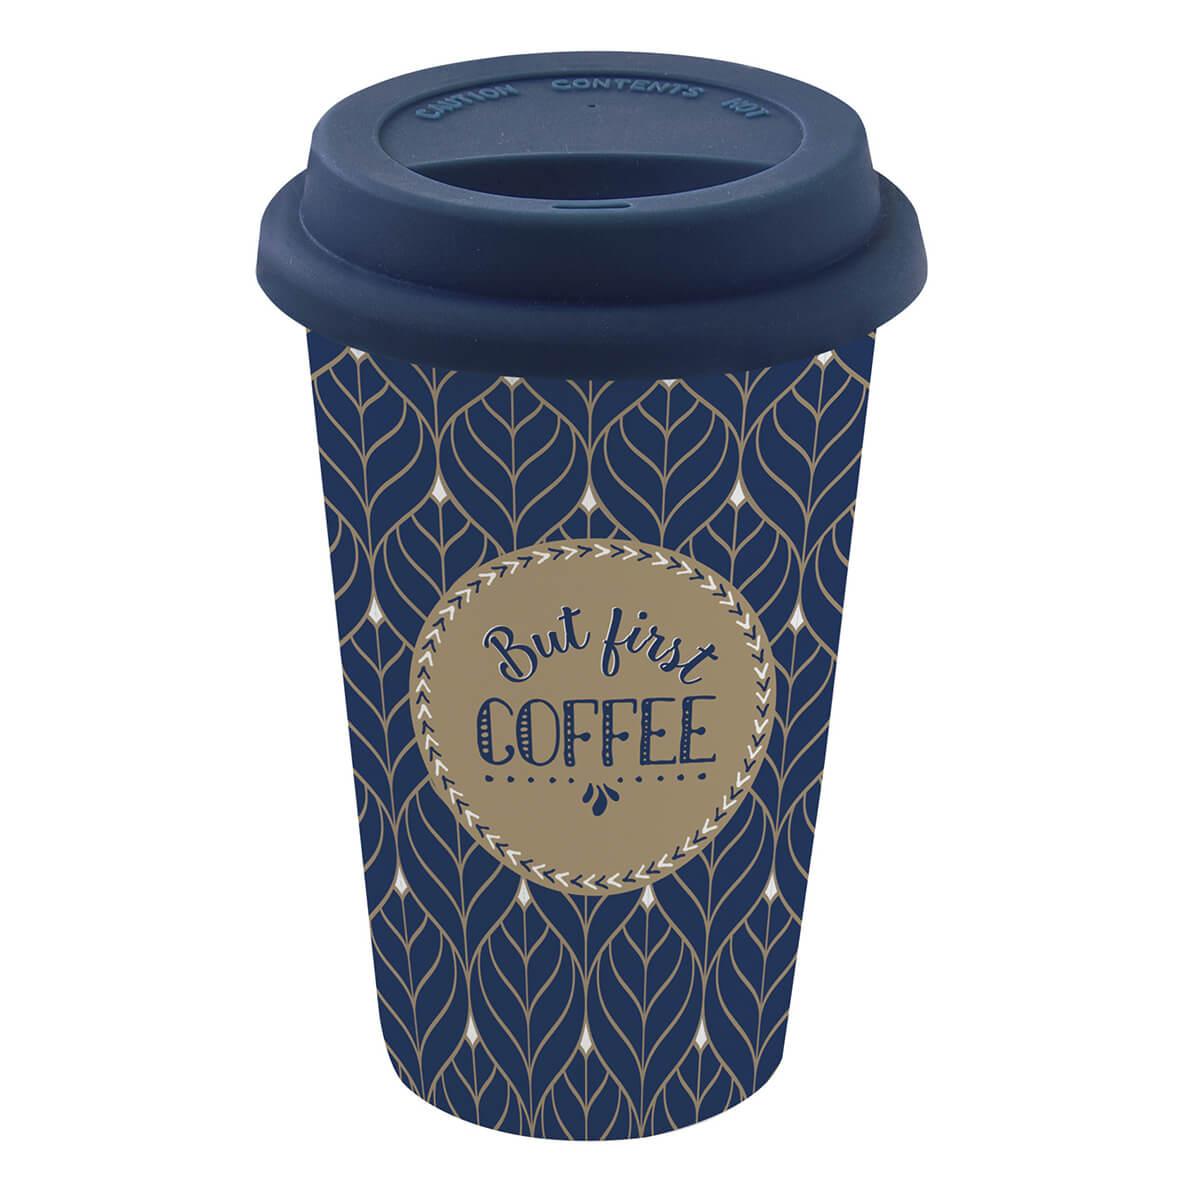 COFFEE ΚΟΥΠΑ ΤΑΞΙΔΙΟΥ 350 ML ΣΙΛΙΚΟΝΗ ΚΑΠΑΚΙ